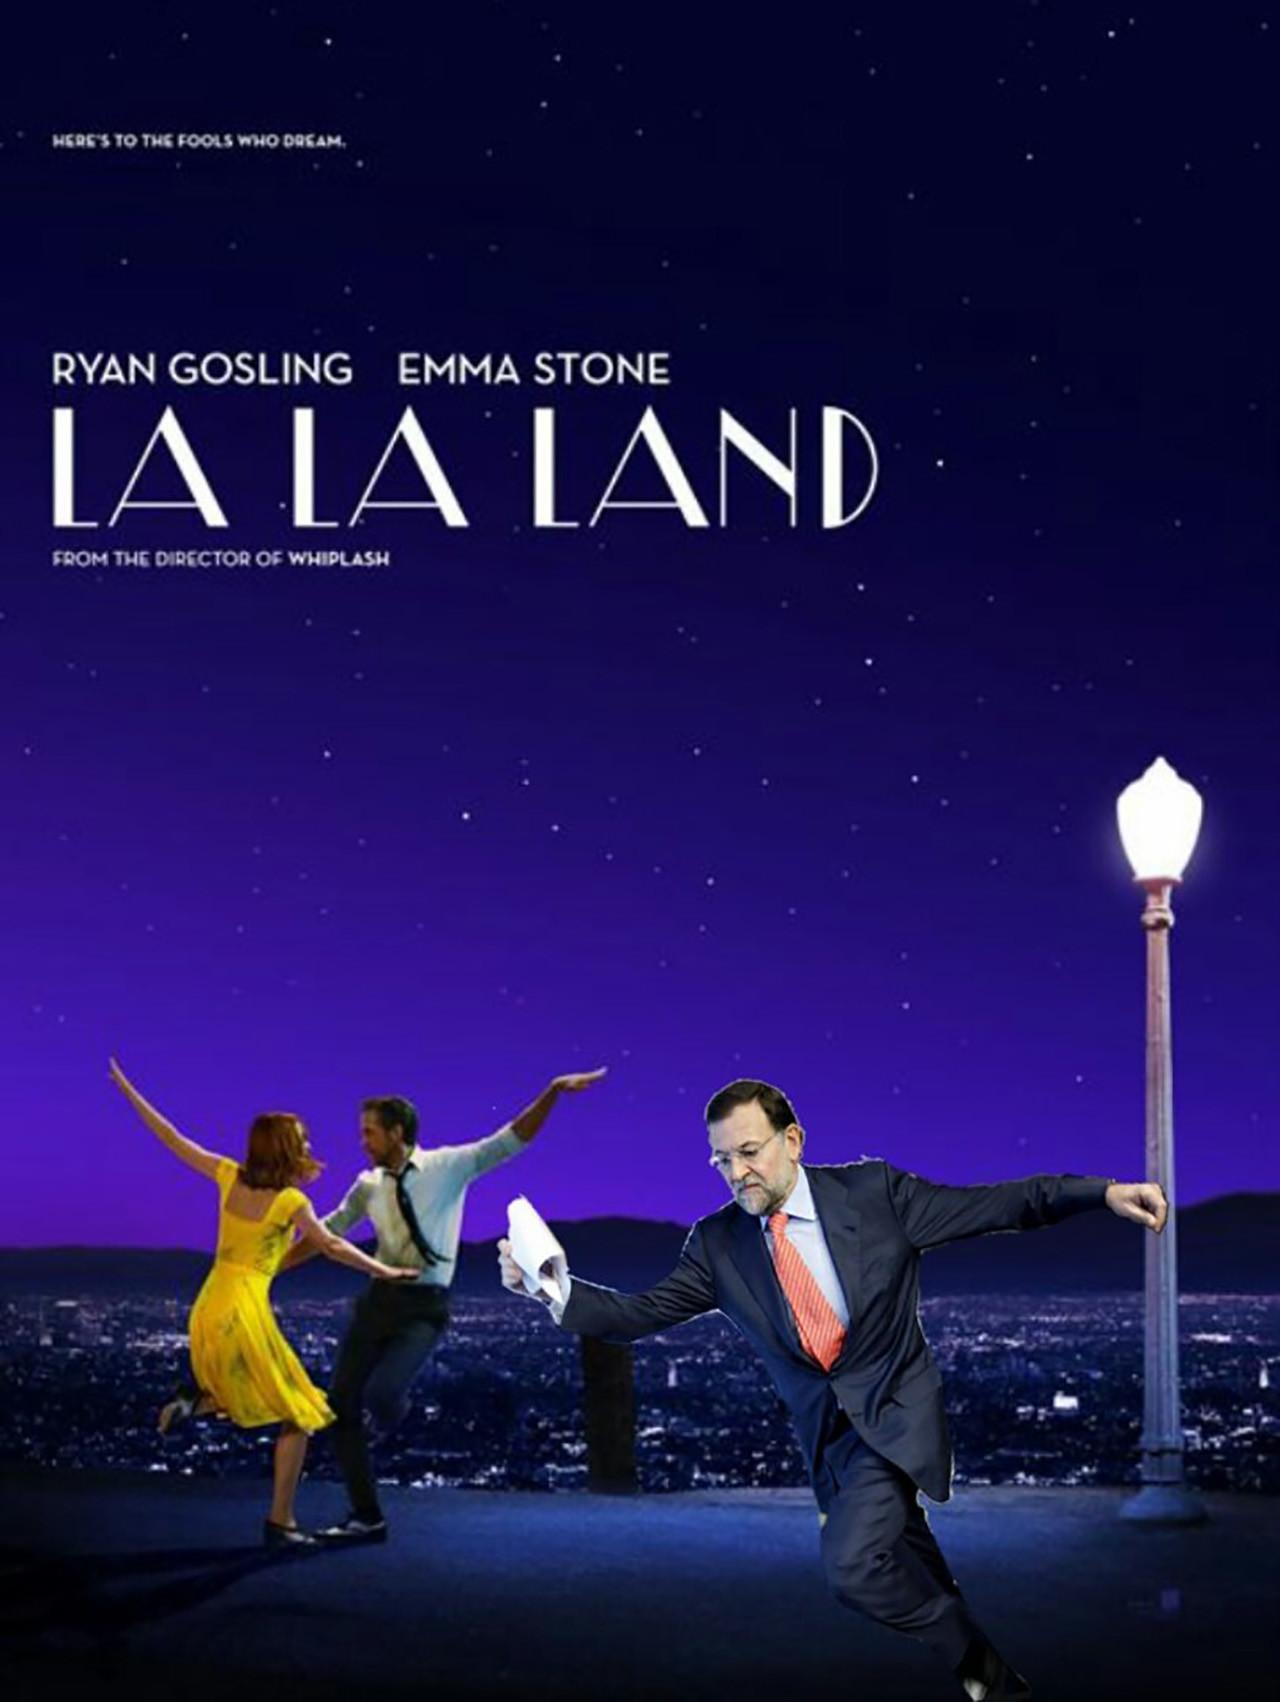 58b3ce3bc461881f388b461a el error en la gala de los oscar 2017 que hizo estallar internet,Memes De Los Oscars 2017